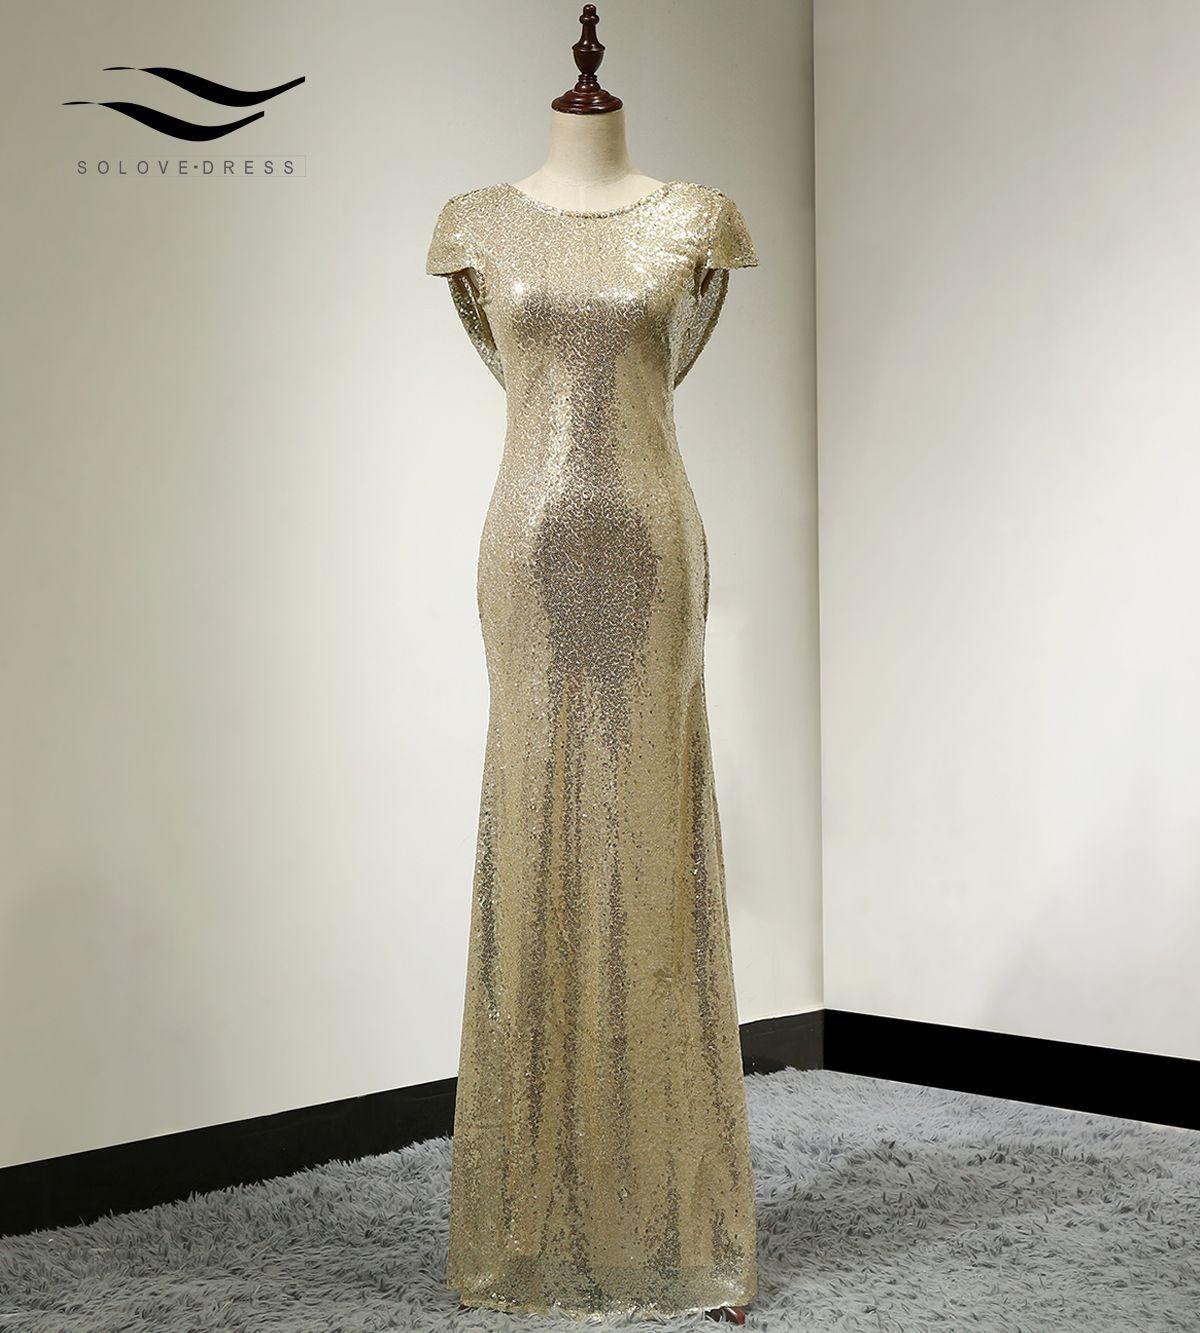 Solovedress 2020 New Mermaid Pailletten-Kappen-Hülsen-formales Abendkleid Realer formaler vestido de dama de honra